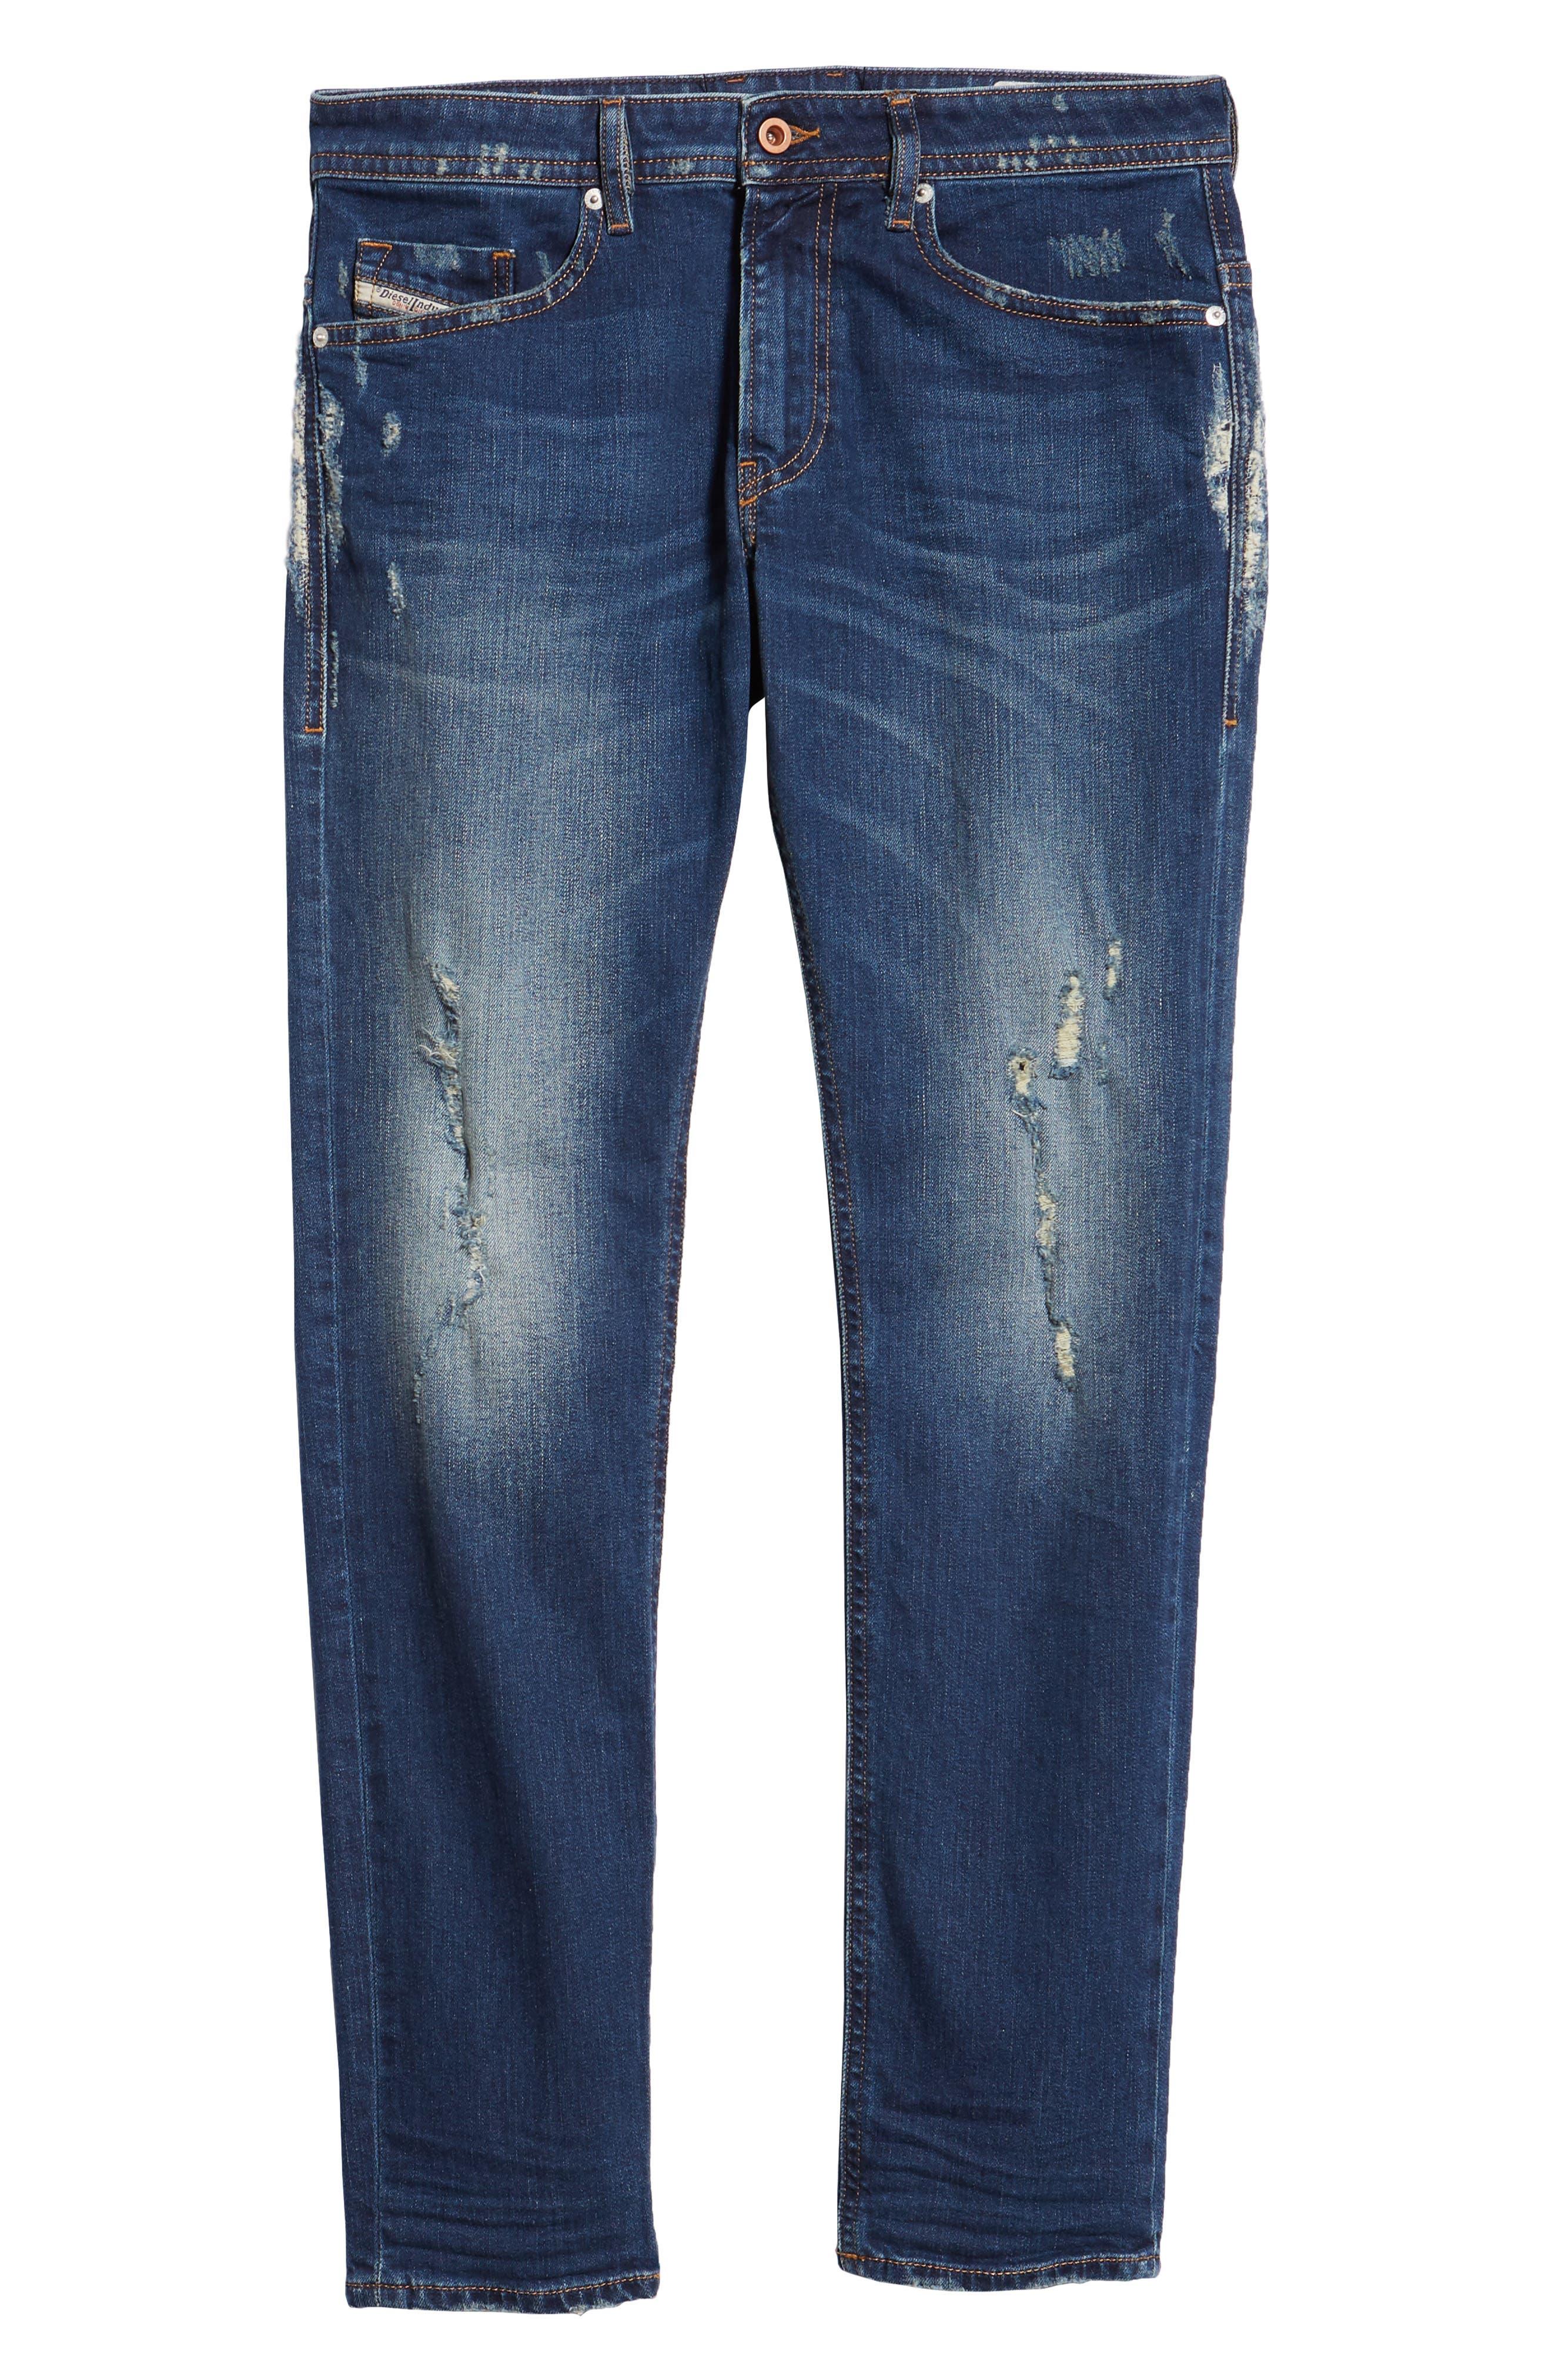 Thommer Slim Fit Jeans,                             Alternate thumbnail 6, color,                             084YY